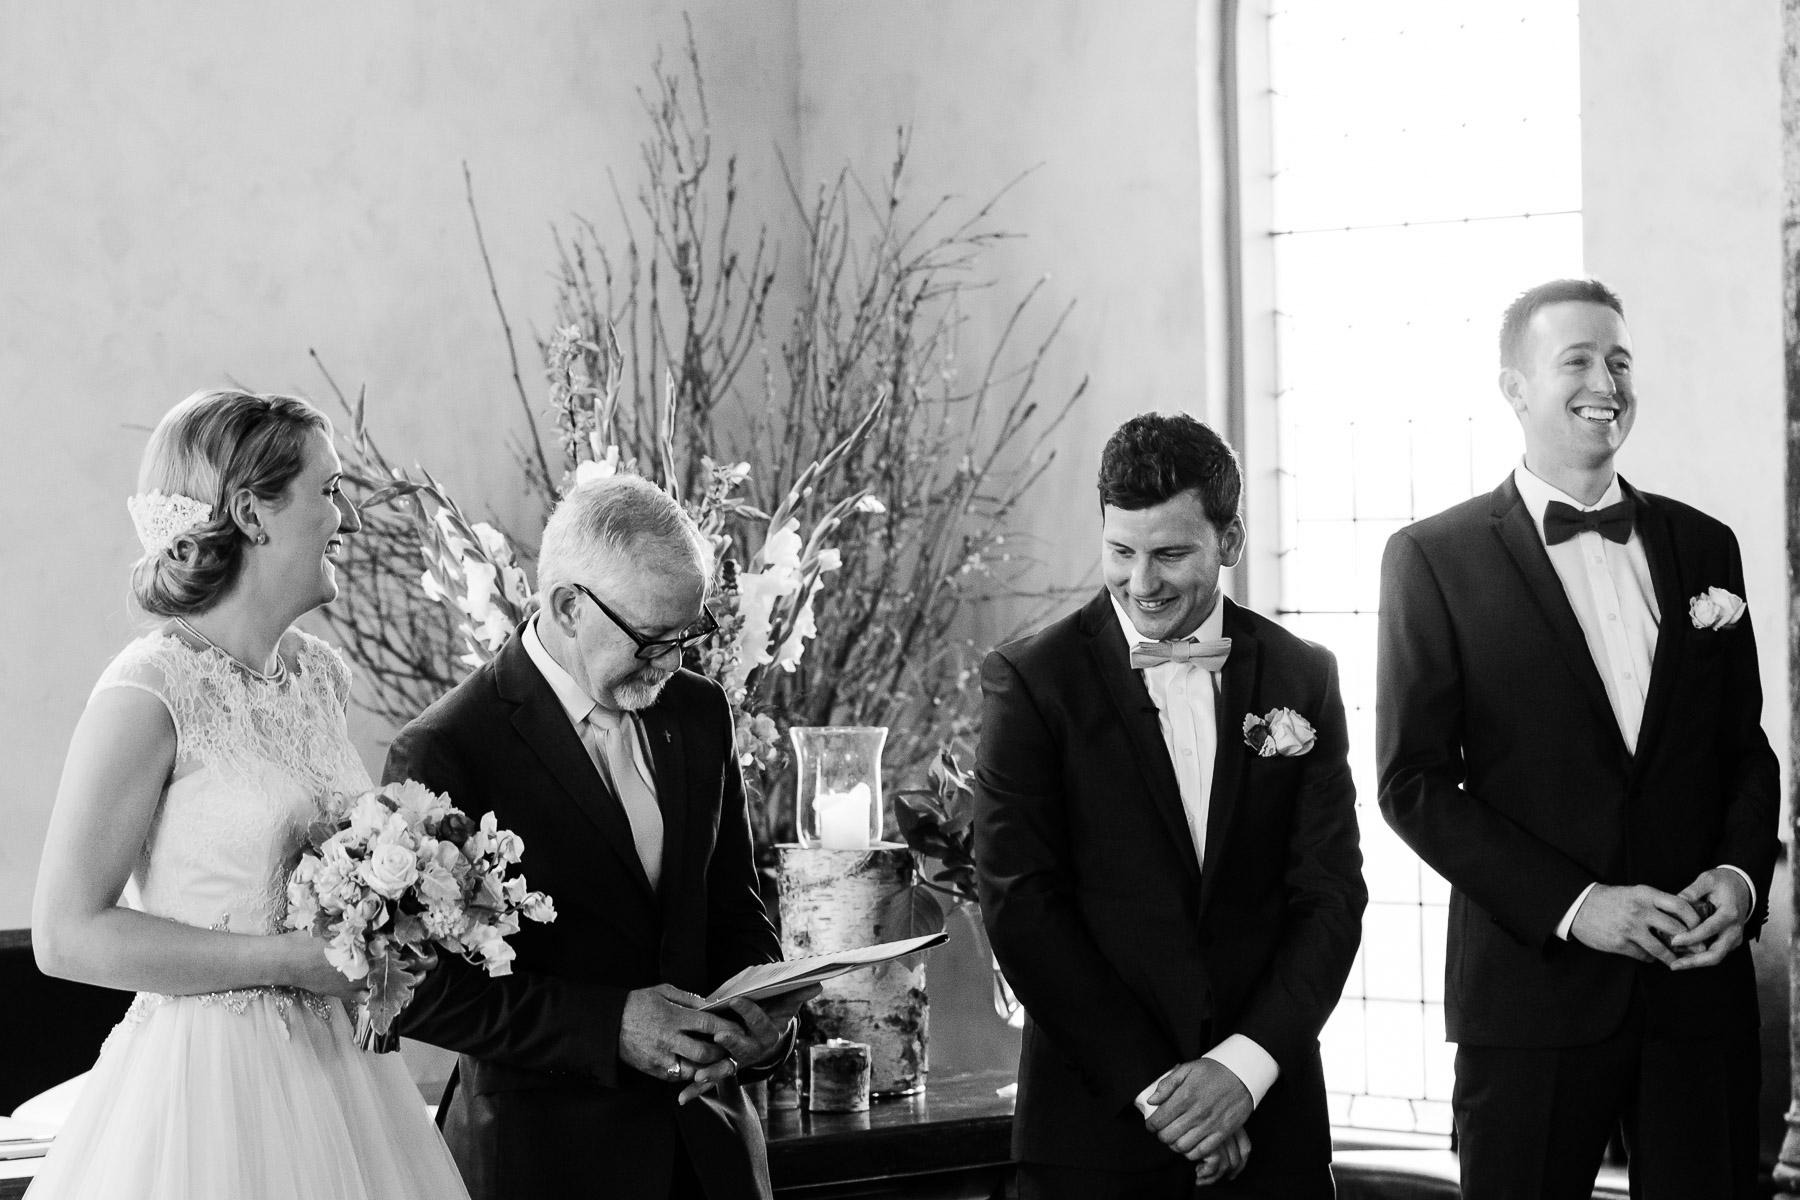 Marnie_and_Charlie_Yarra_Valley_Wedding_Blog-45.jpg